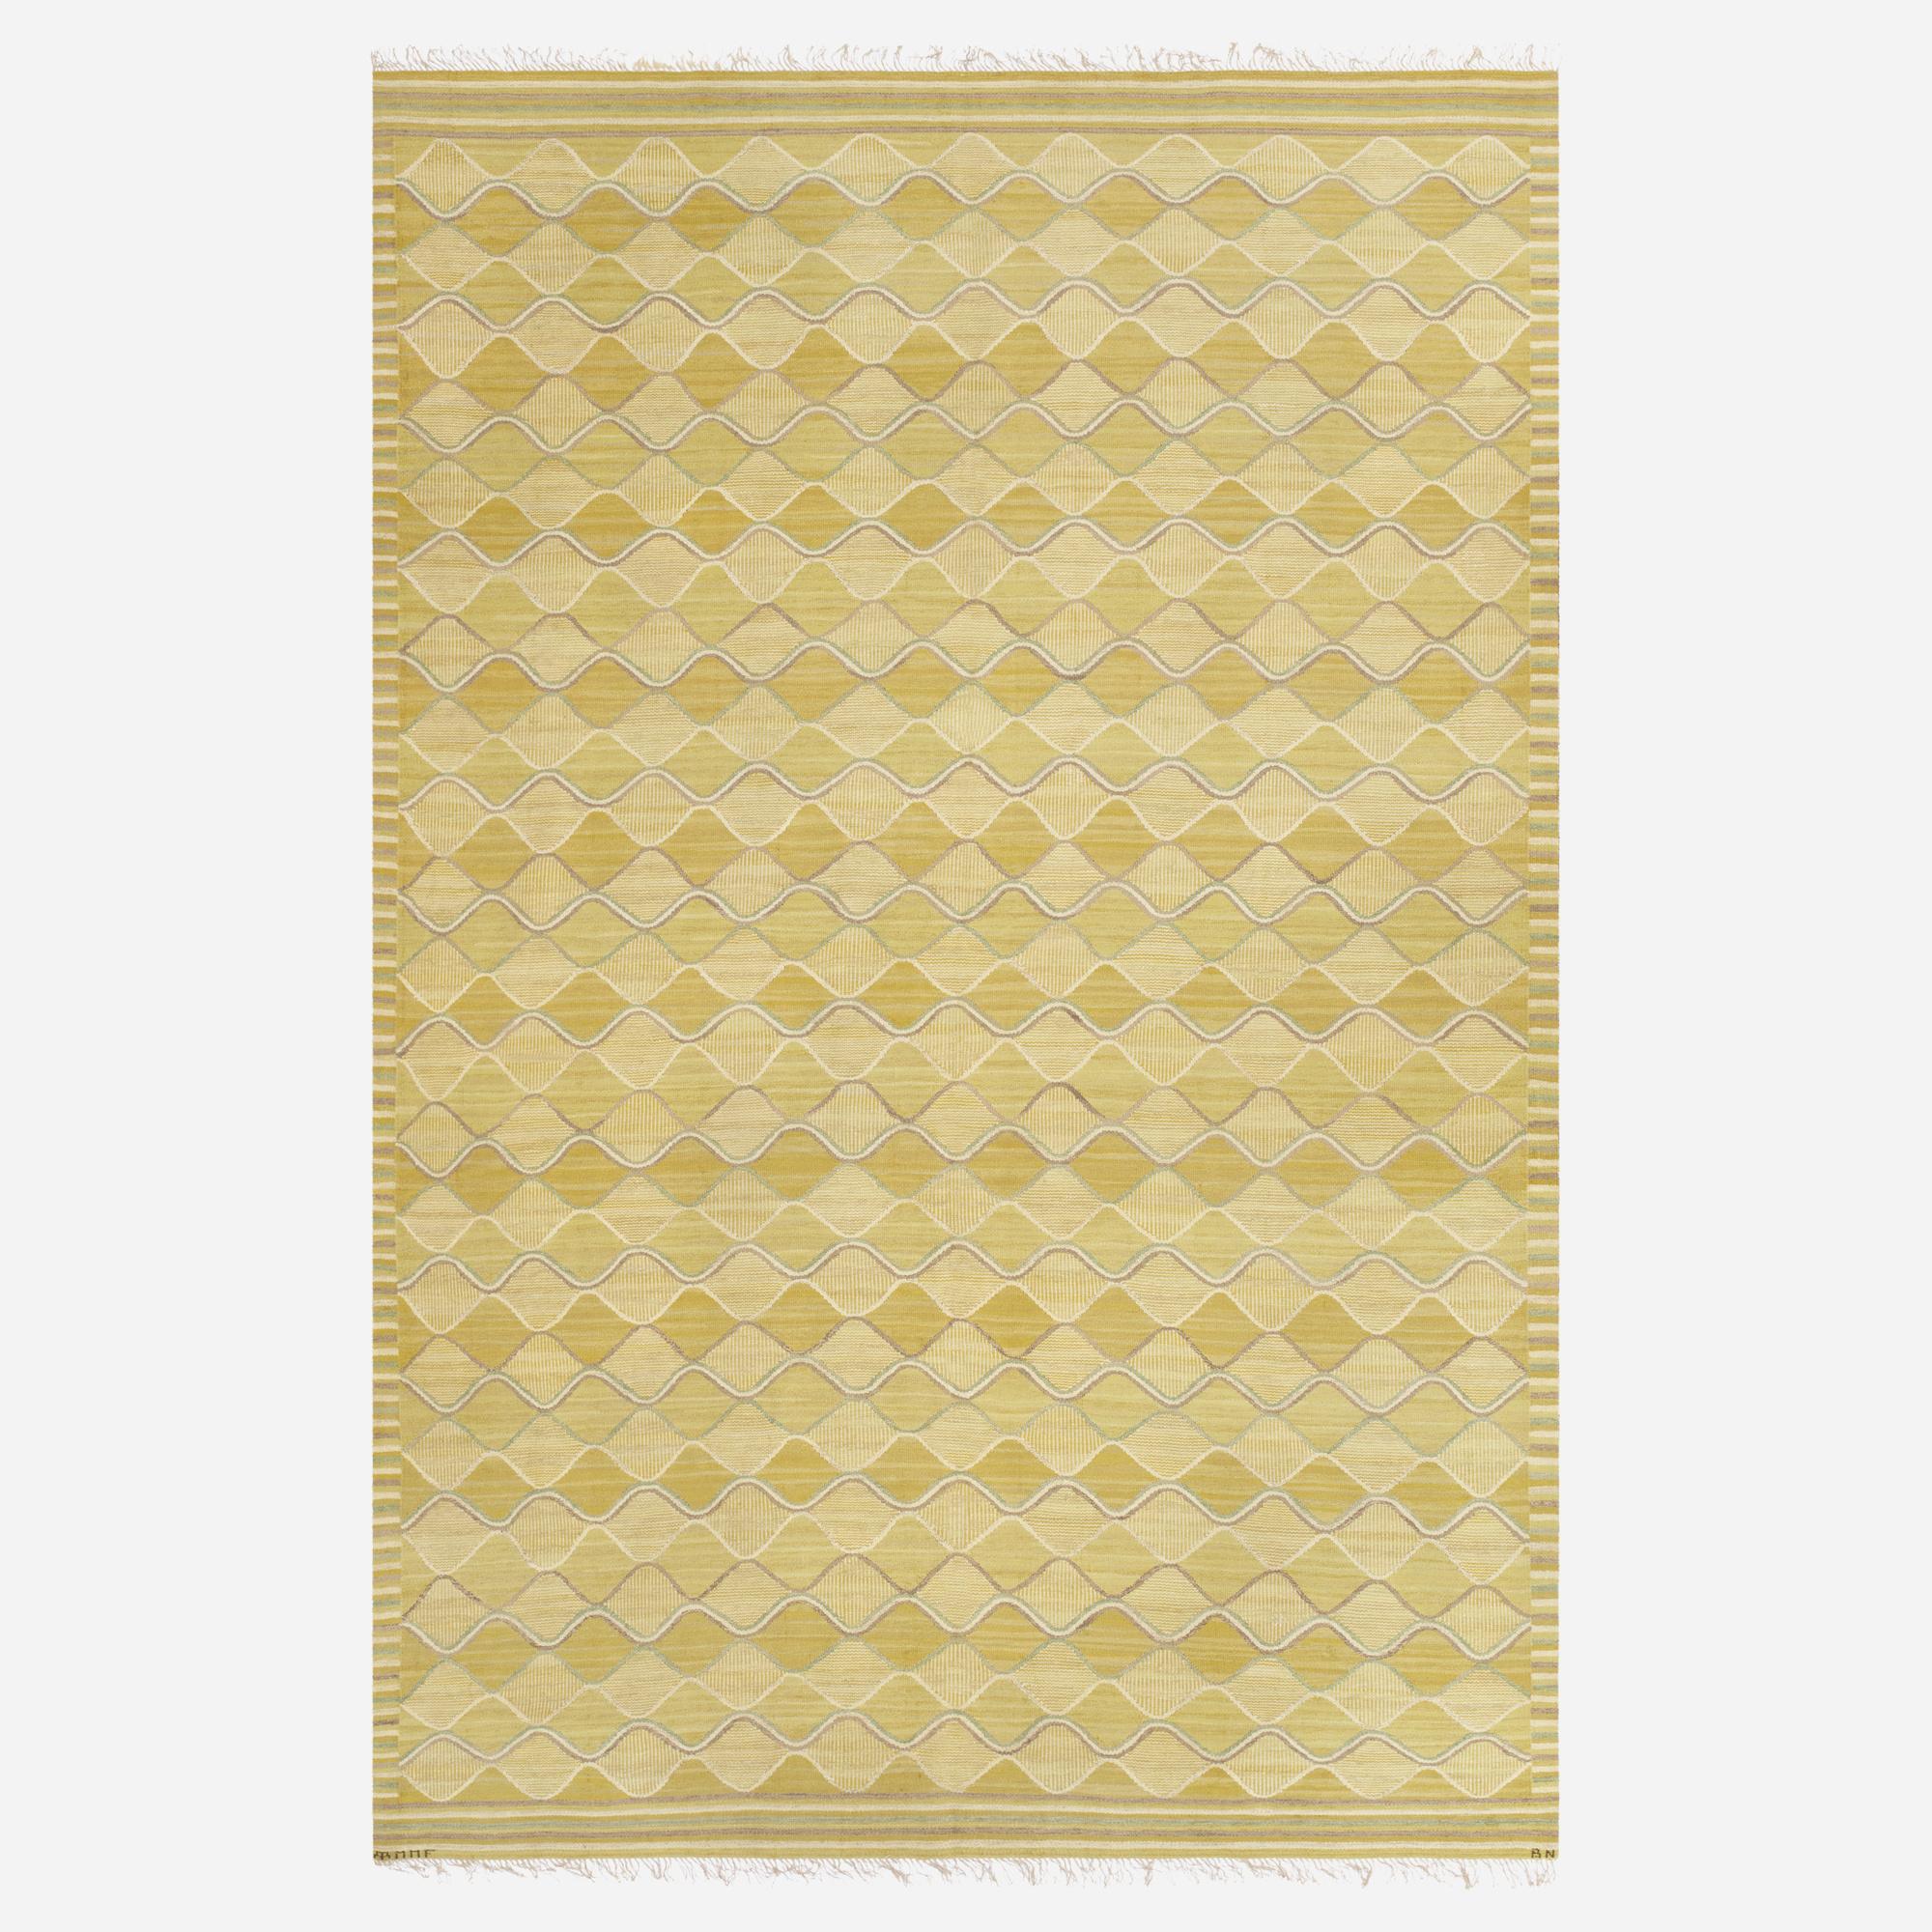 167: Barbro Nilsson / Spättan tapestry weave carpet (1 of 1)